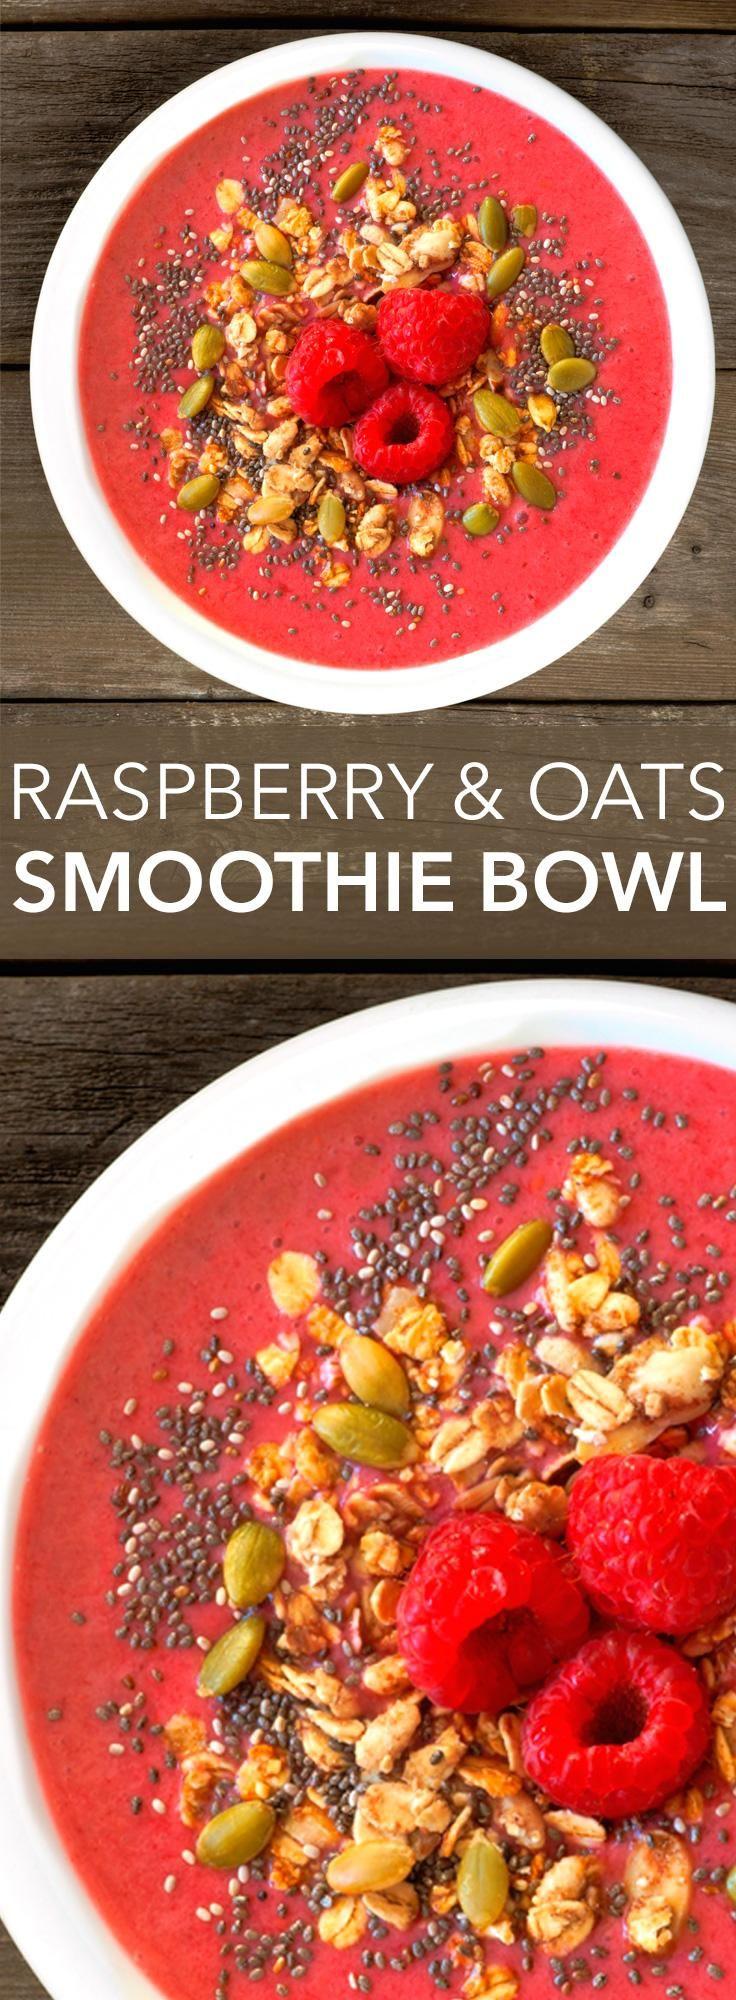 Raspberry Oats Smoothie Bowl